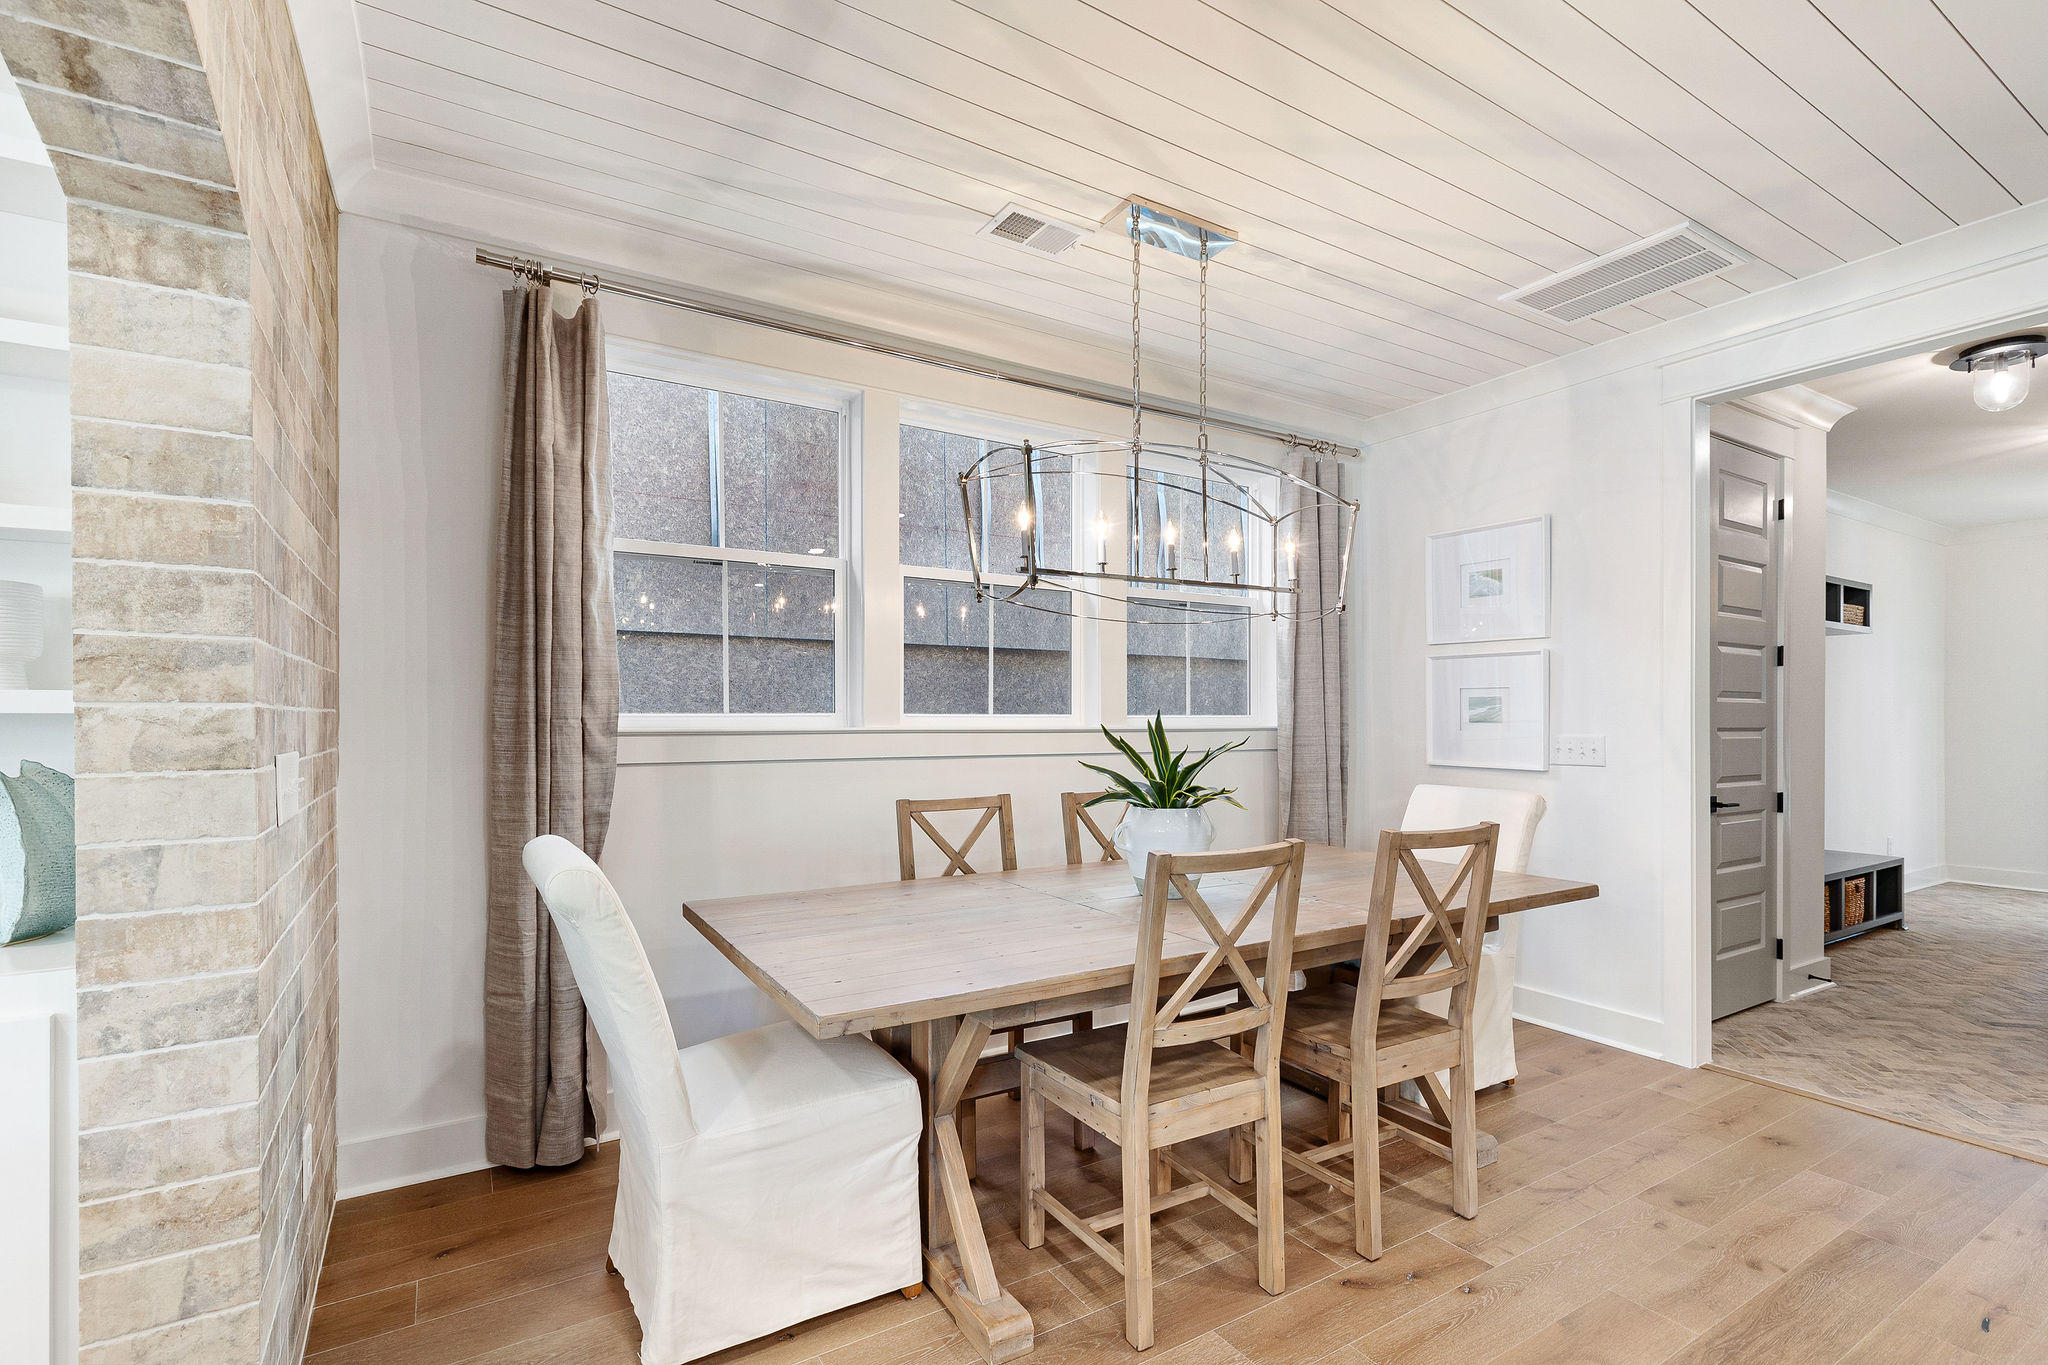 Avenue of Oaks Homes For Sale - 1027 Avenue Of Oaks, Charleston, SC - 29